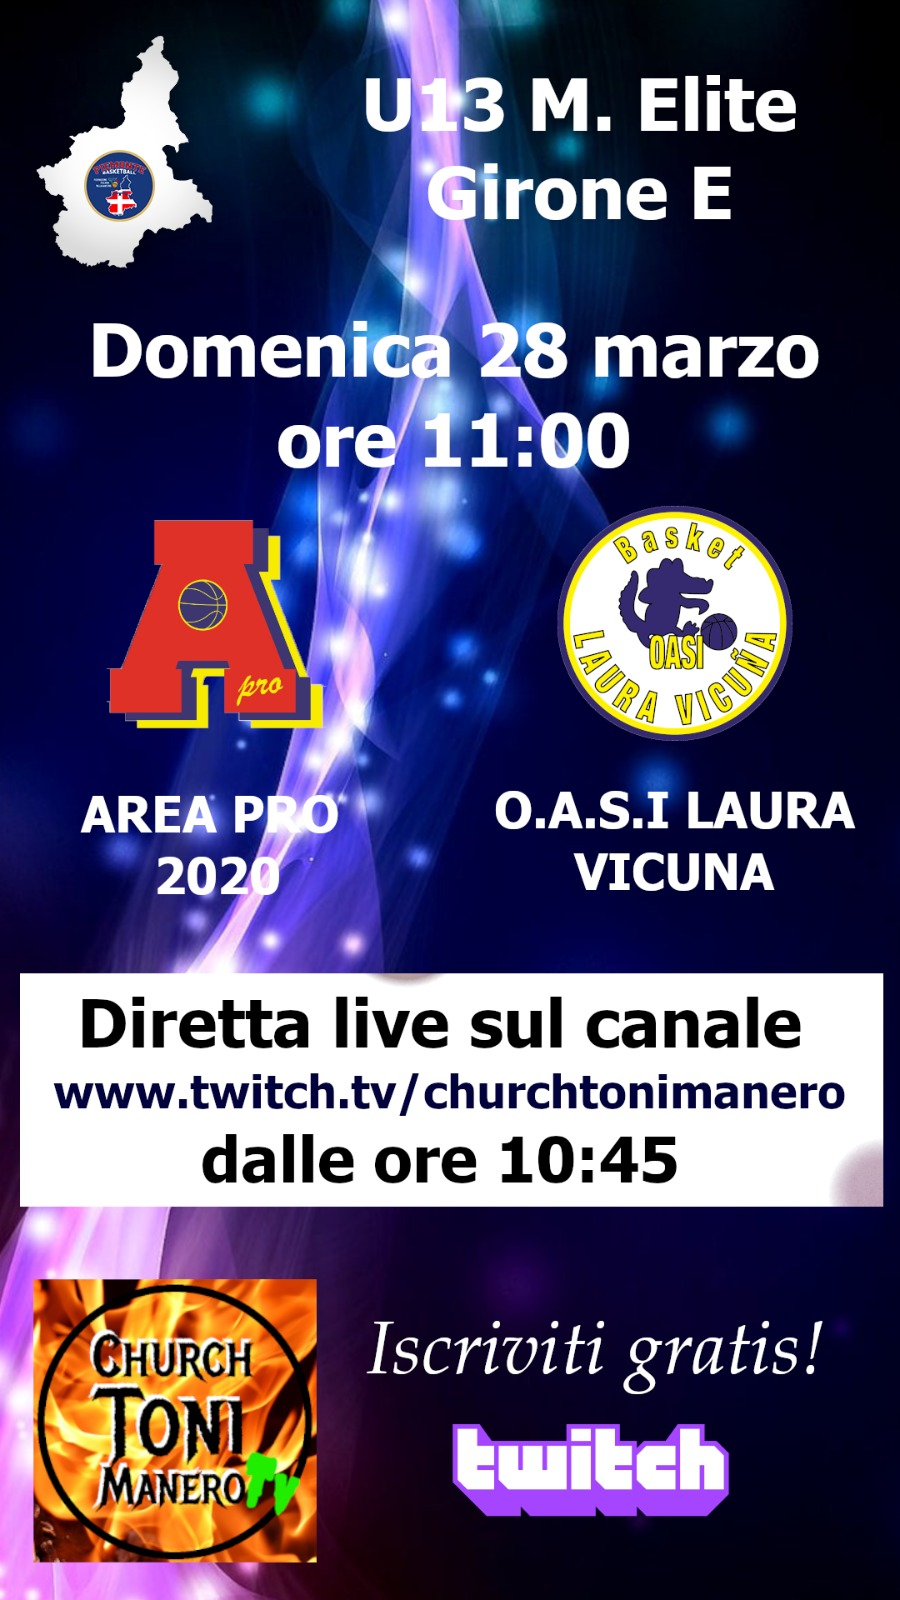 Under 13 Elite Area Pro 2020-Oasi Laura Vicuna, diretta video